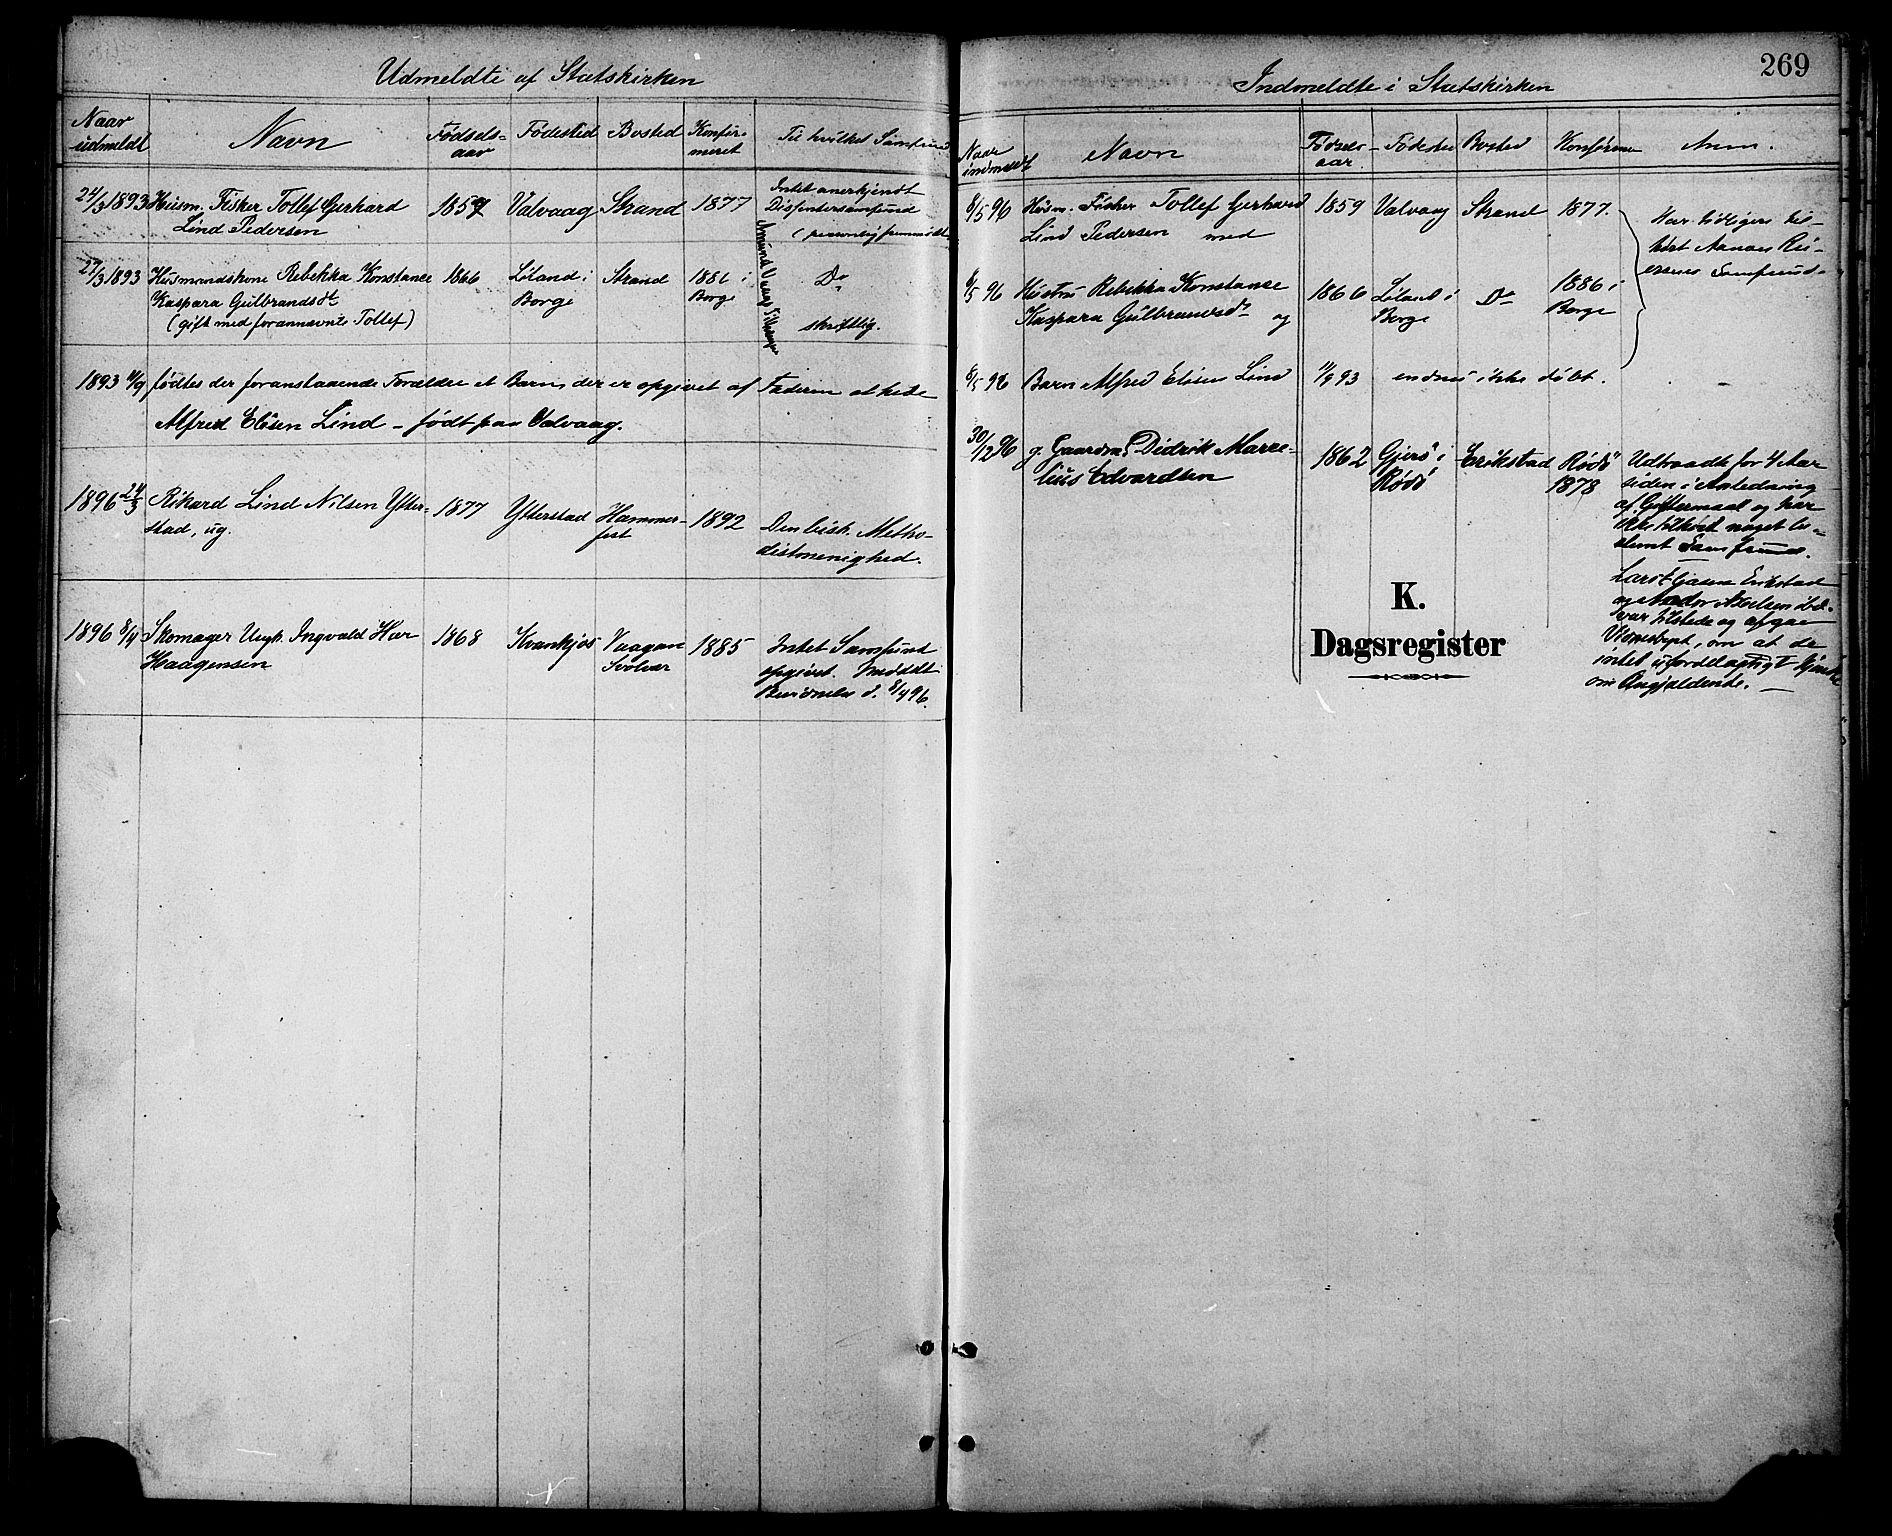 SAT, Ministerialprotokoller, klokkerbøker og fødselsregistre - Nordland, 872/L1035: Ministerialbok nr. 872A10, 1884-1896, s. 269